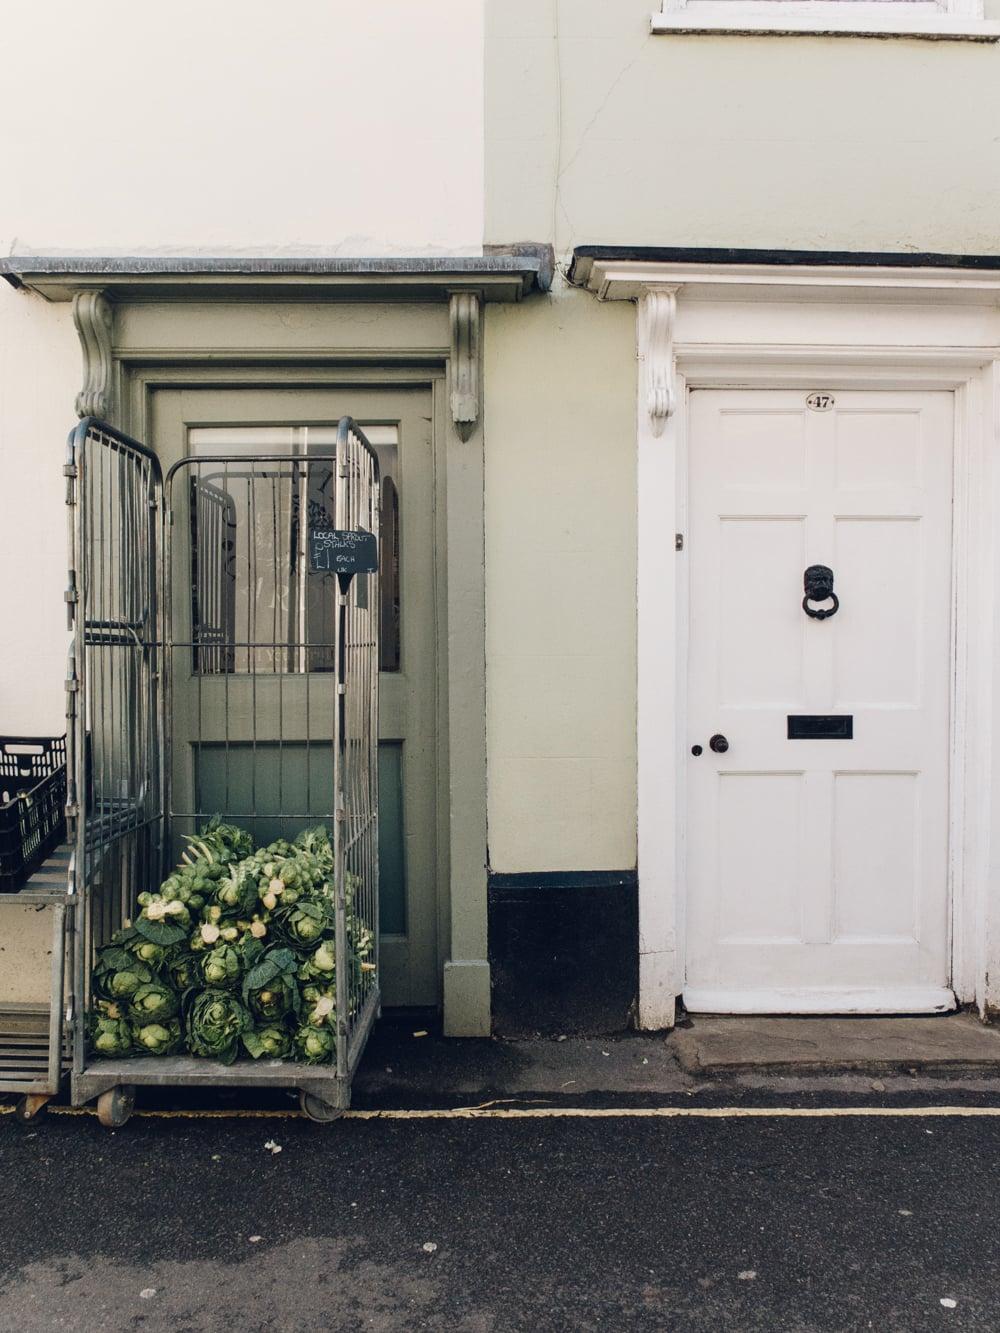 Haarkon Wells Wells-next-the-sea Coast Norfolk architecture Vegetables Sprouts Shop Grocer